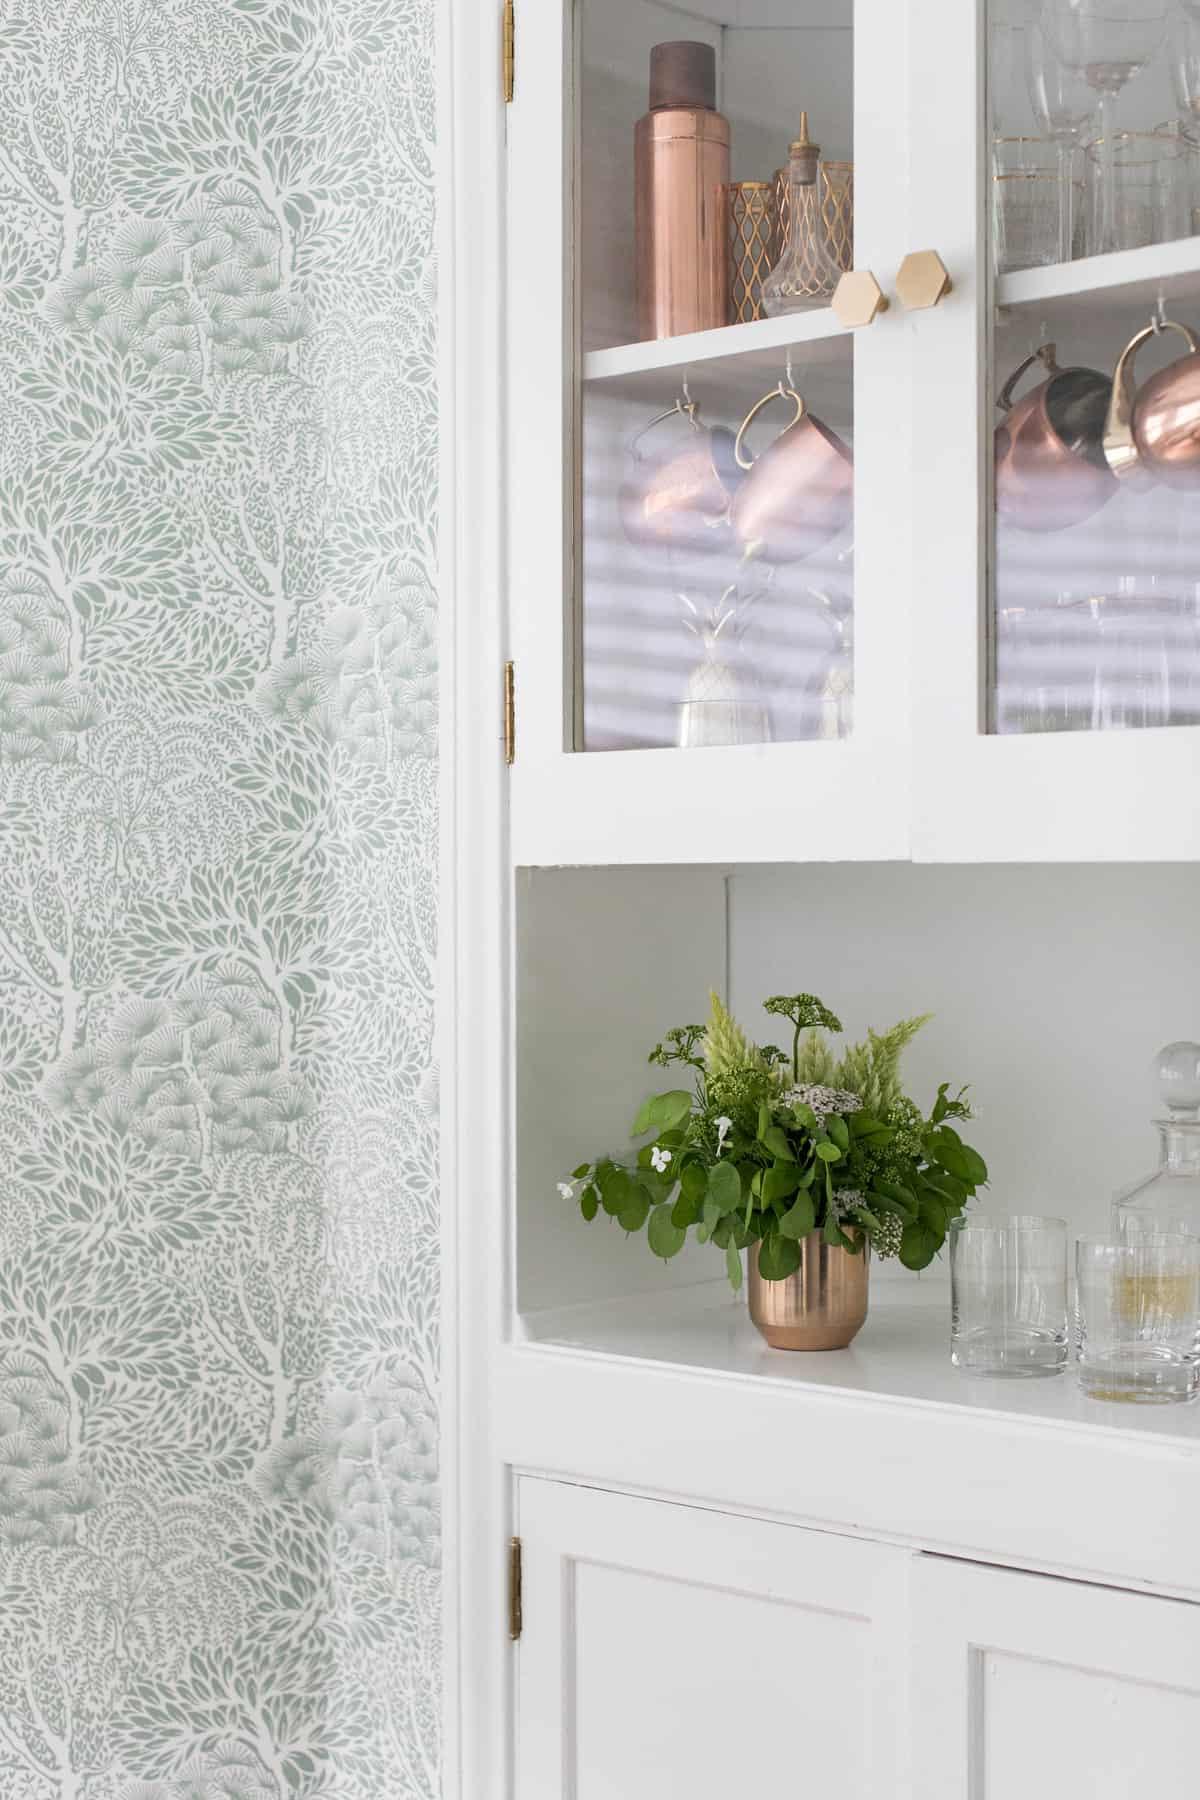 Kitchen nook with pretty wallpaper